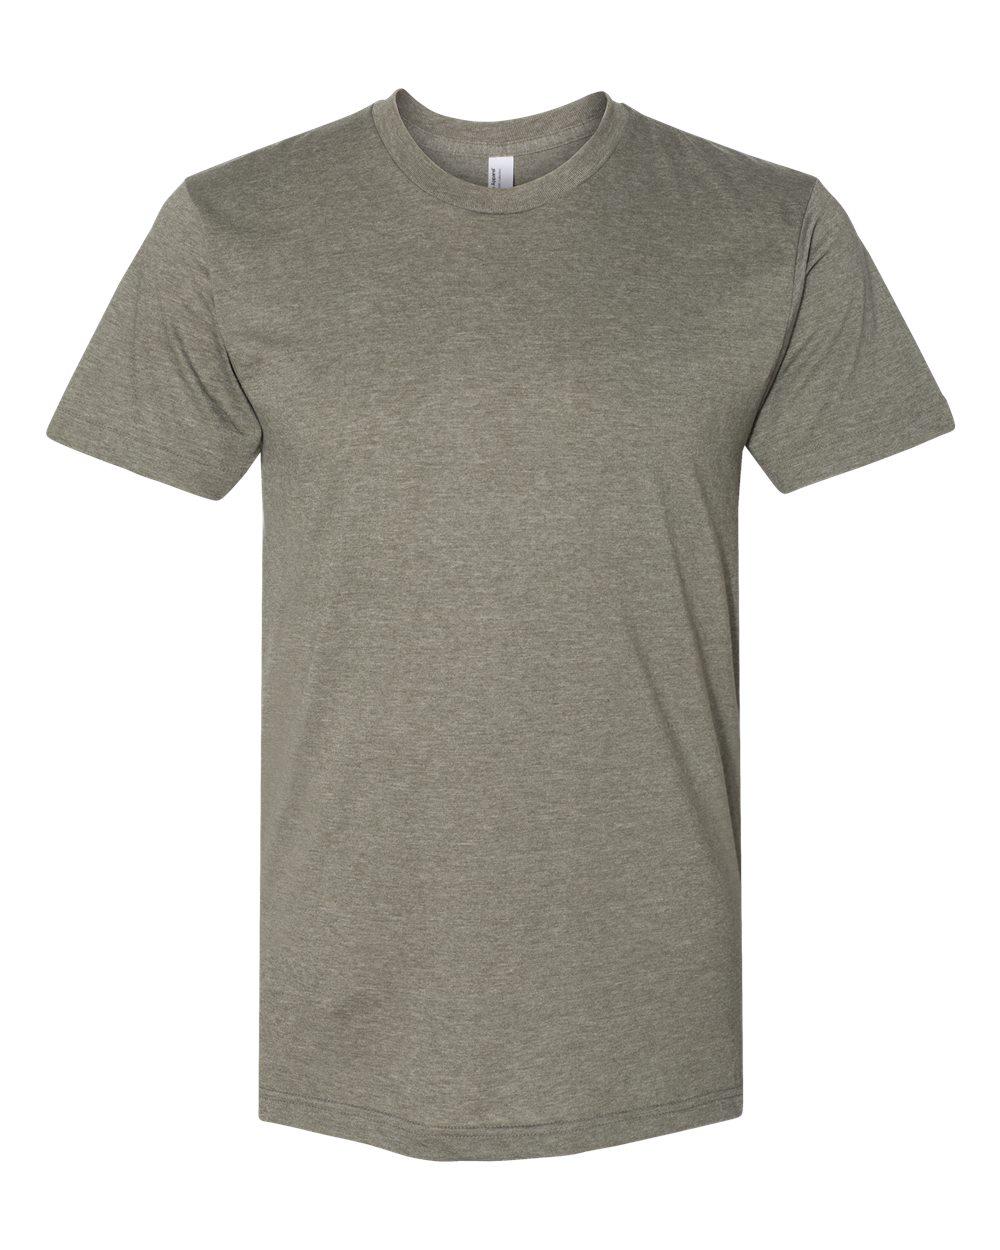 American-Apparel-Mens-Slim-Fit-50-50-Cotton-T-Shirt-Tee-BB401W-up-to-2XL thumbnail 30